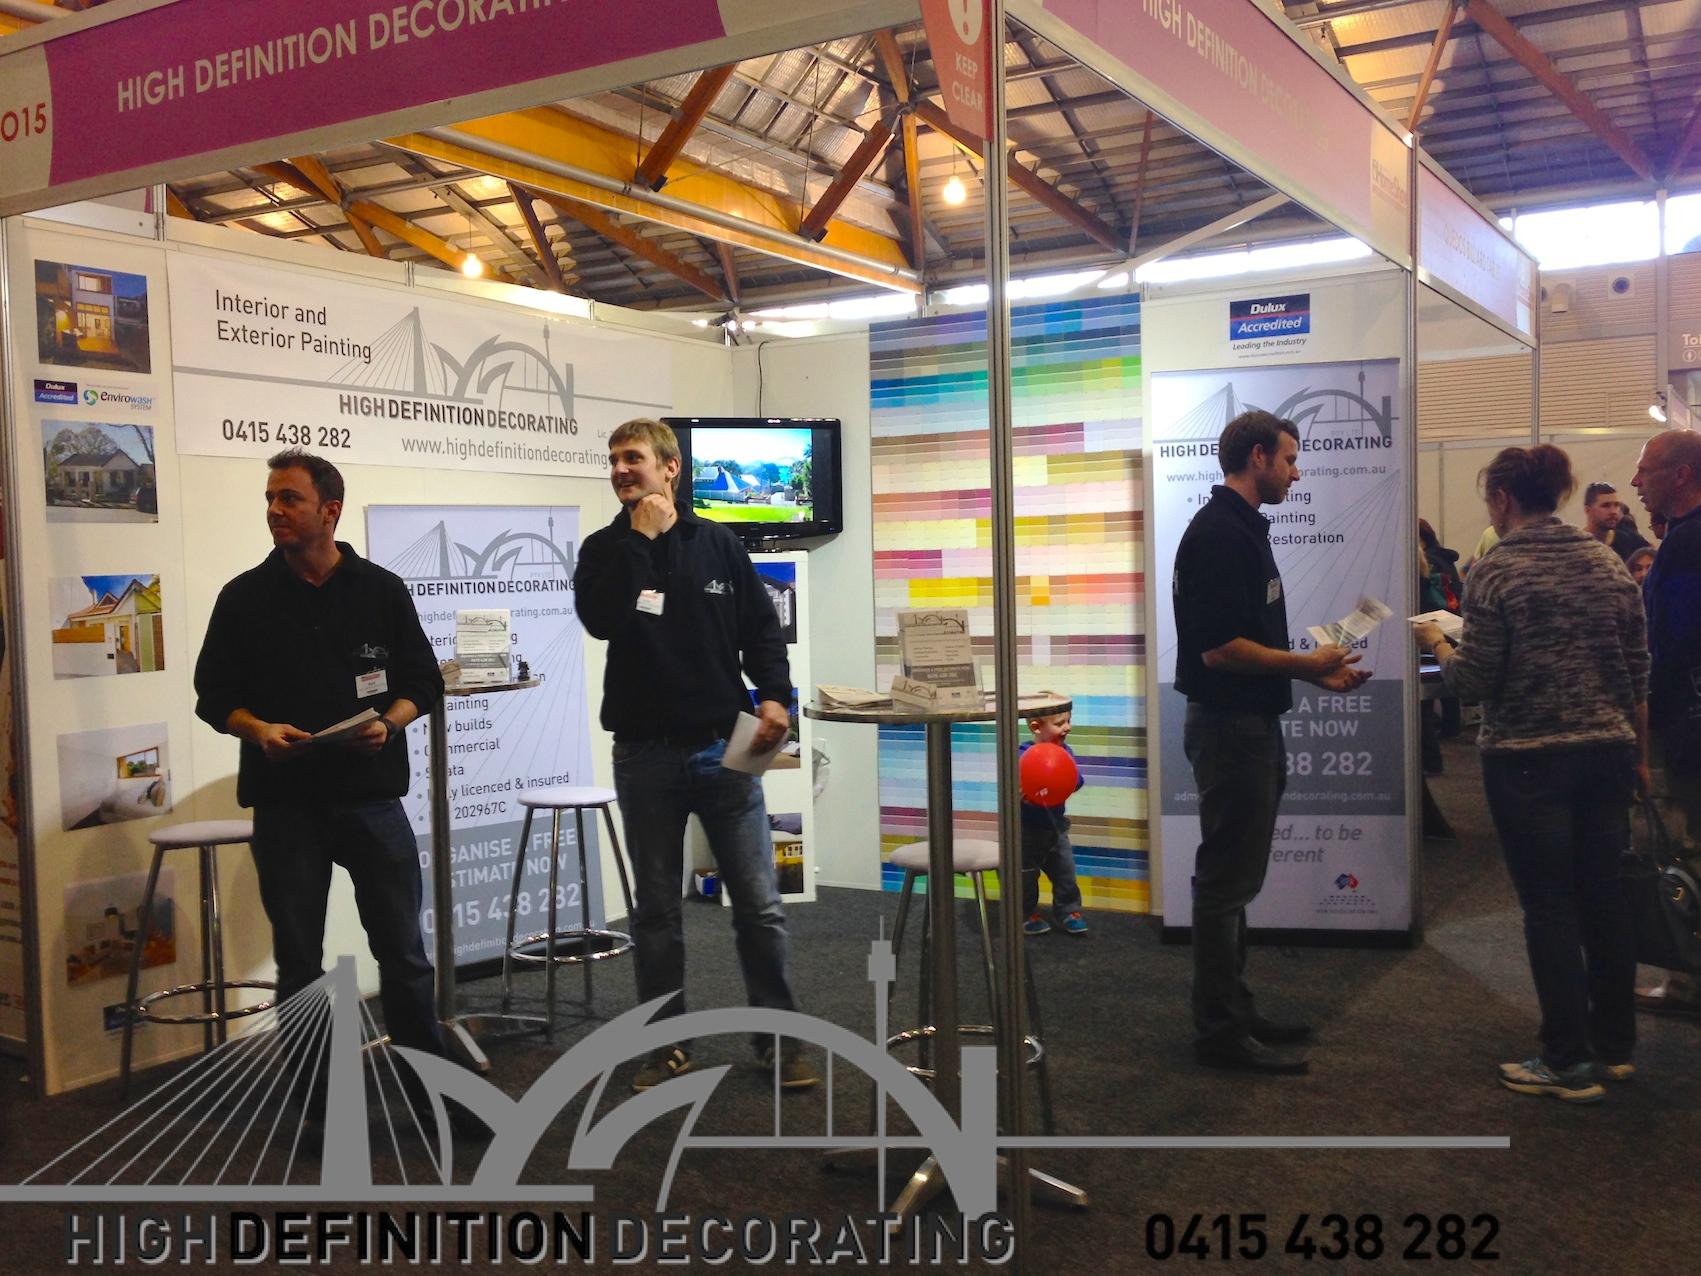 Hia Sydney Home Show 2014- High Definition Decorating